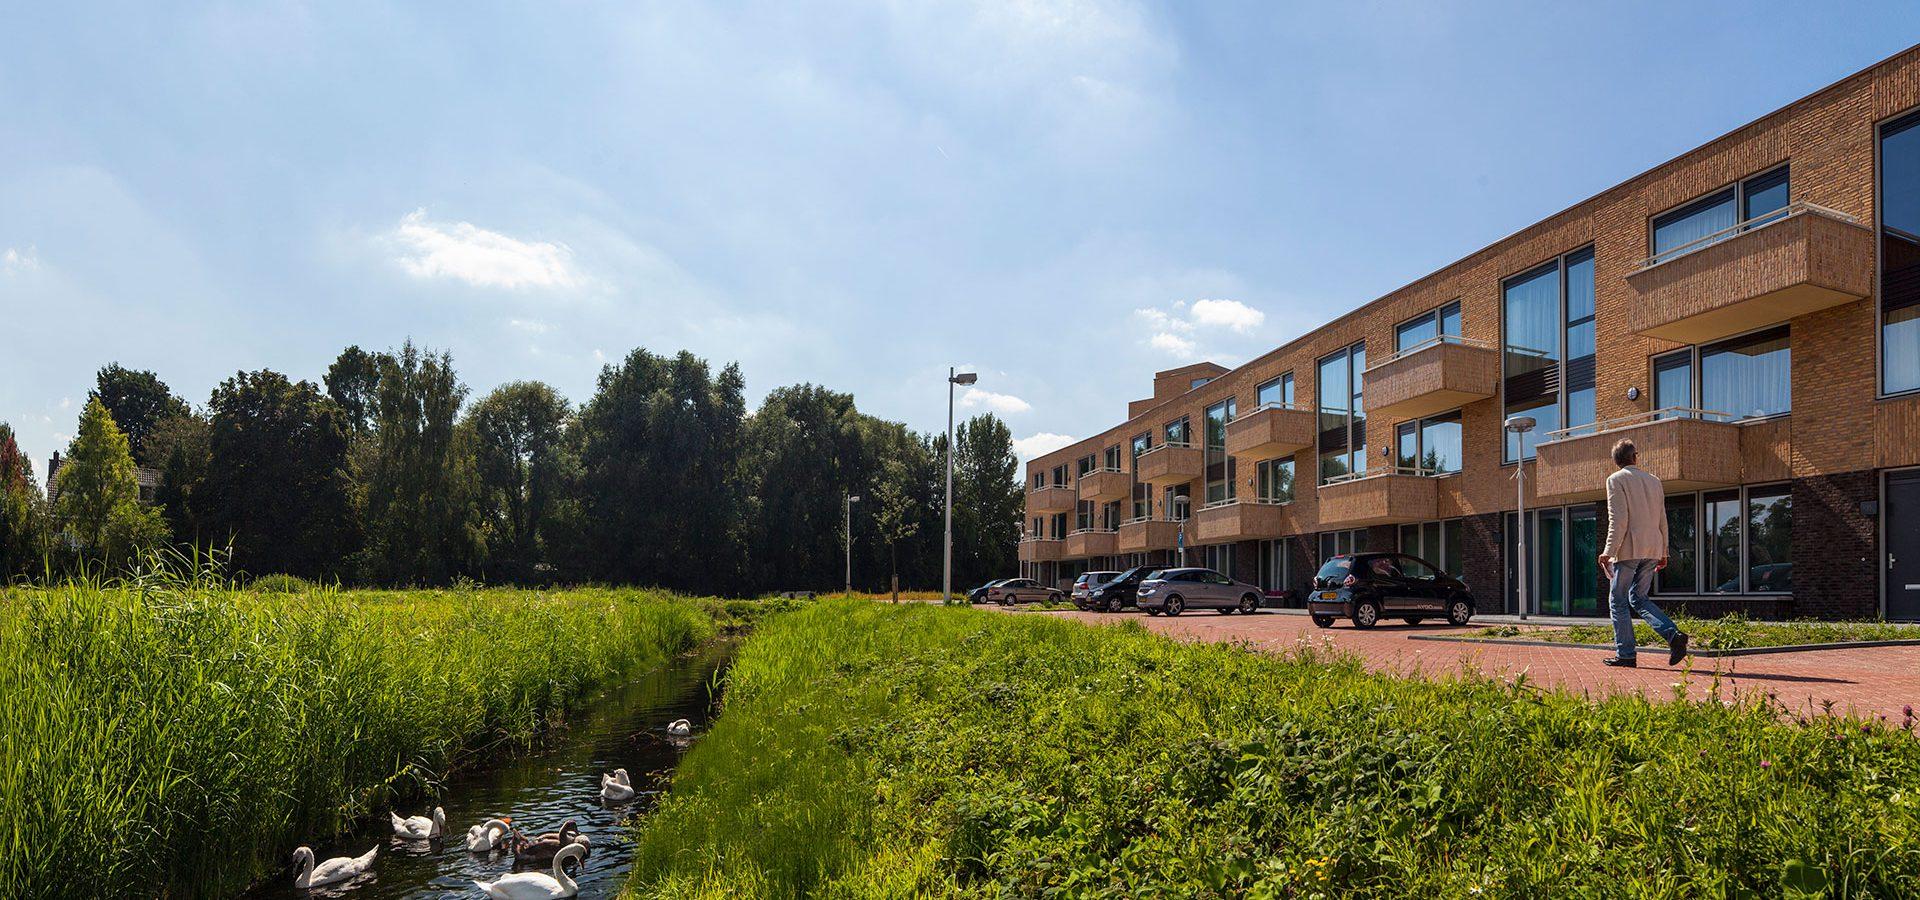 FARO architecten 't Zand Leidsche Rijn Utrecht 03